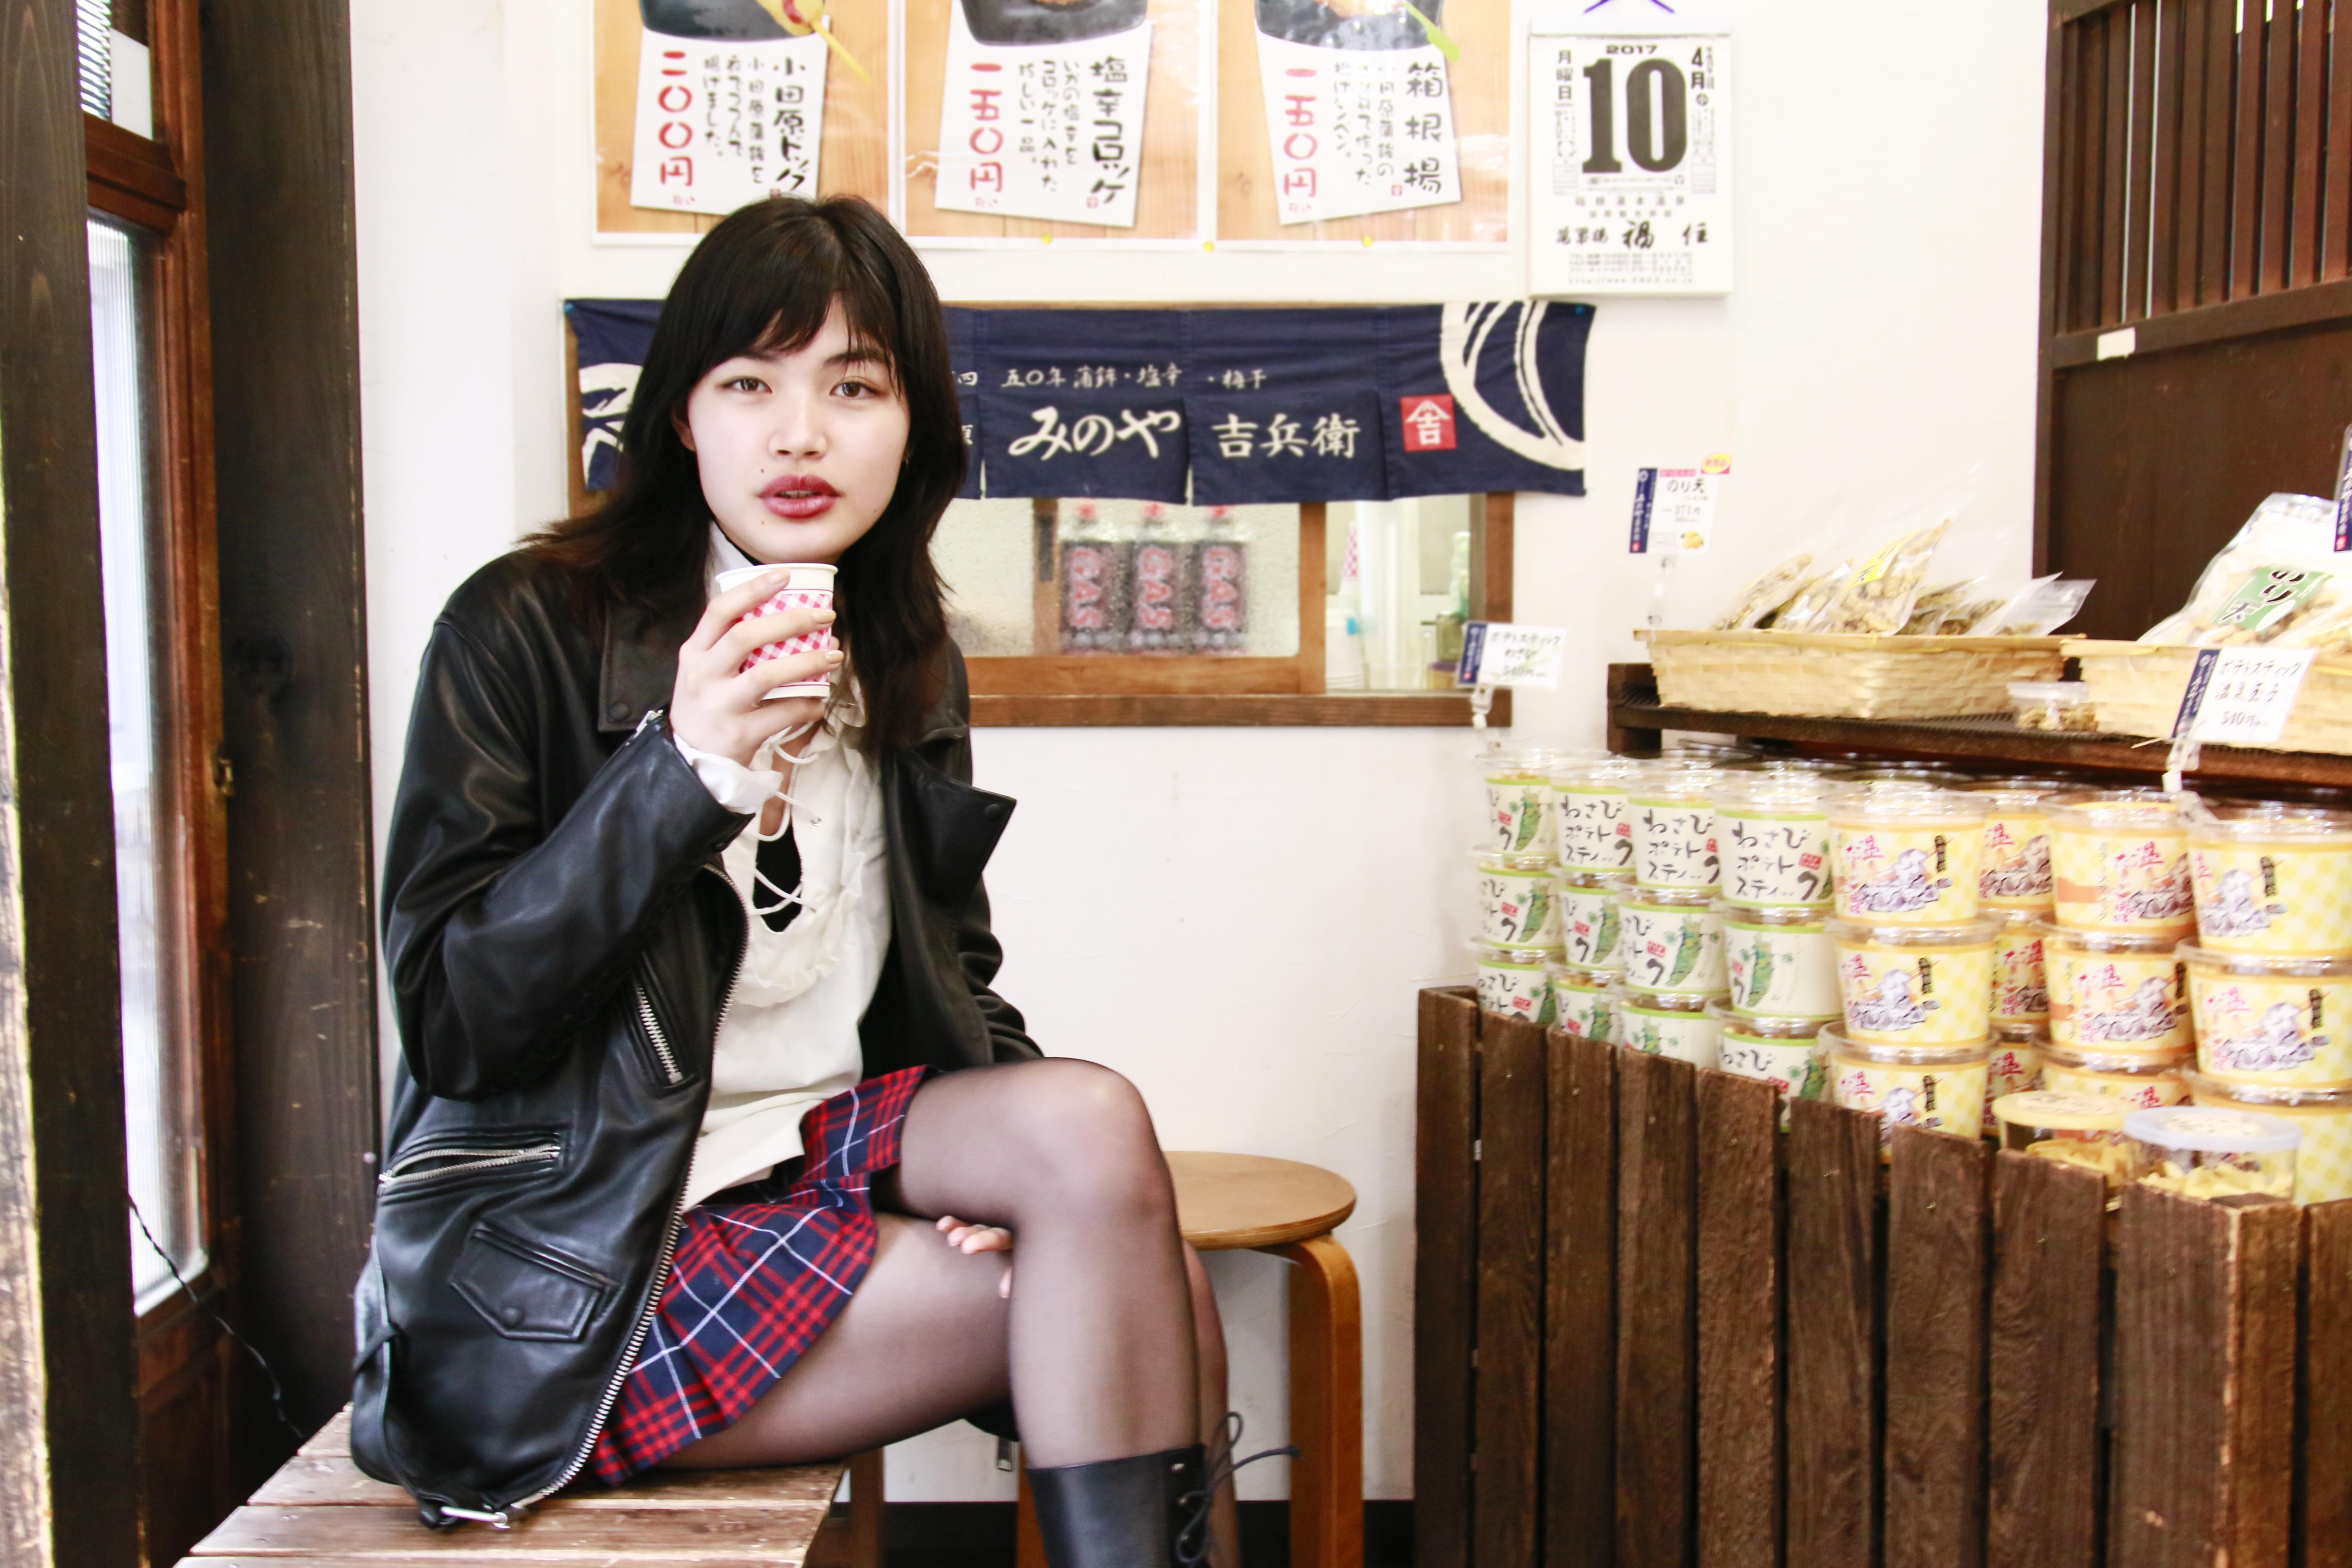 ALLSAINTS_Rina Fukushi_8